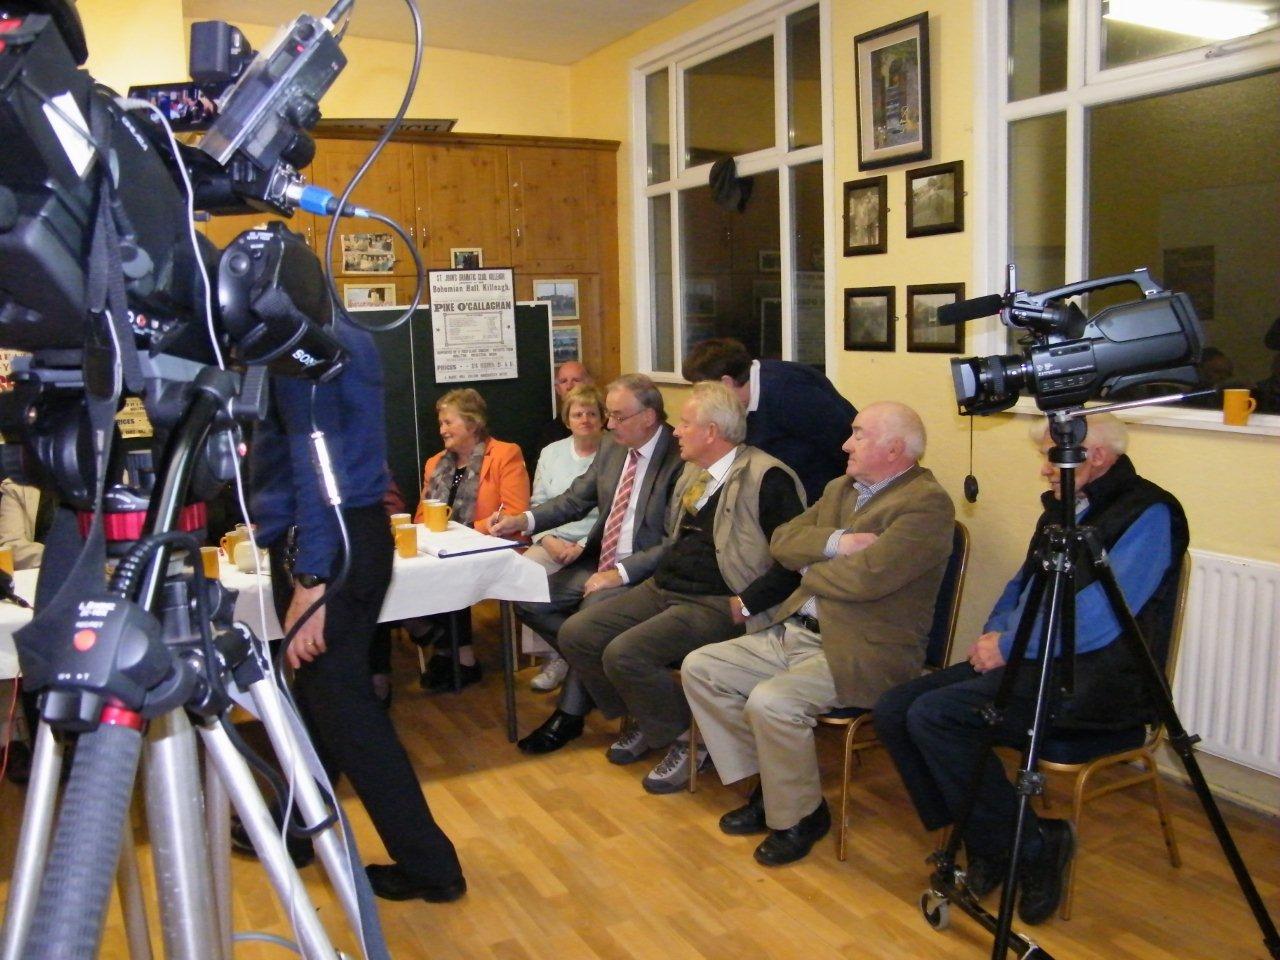 Recording session in Killeagh Community Hall